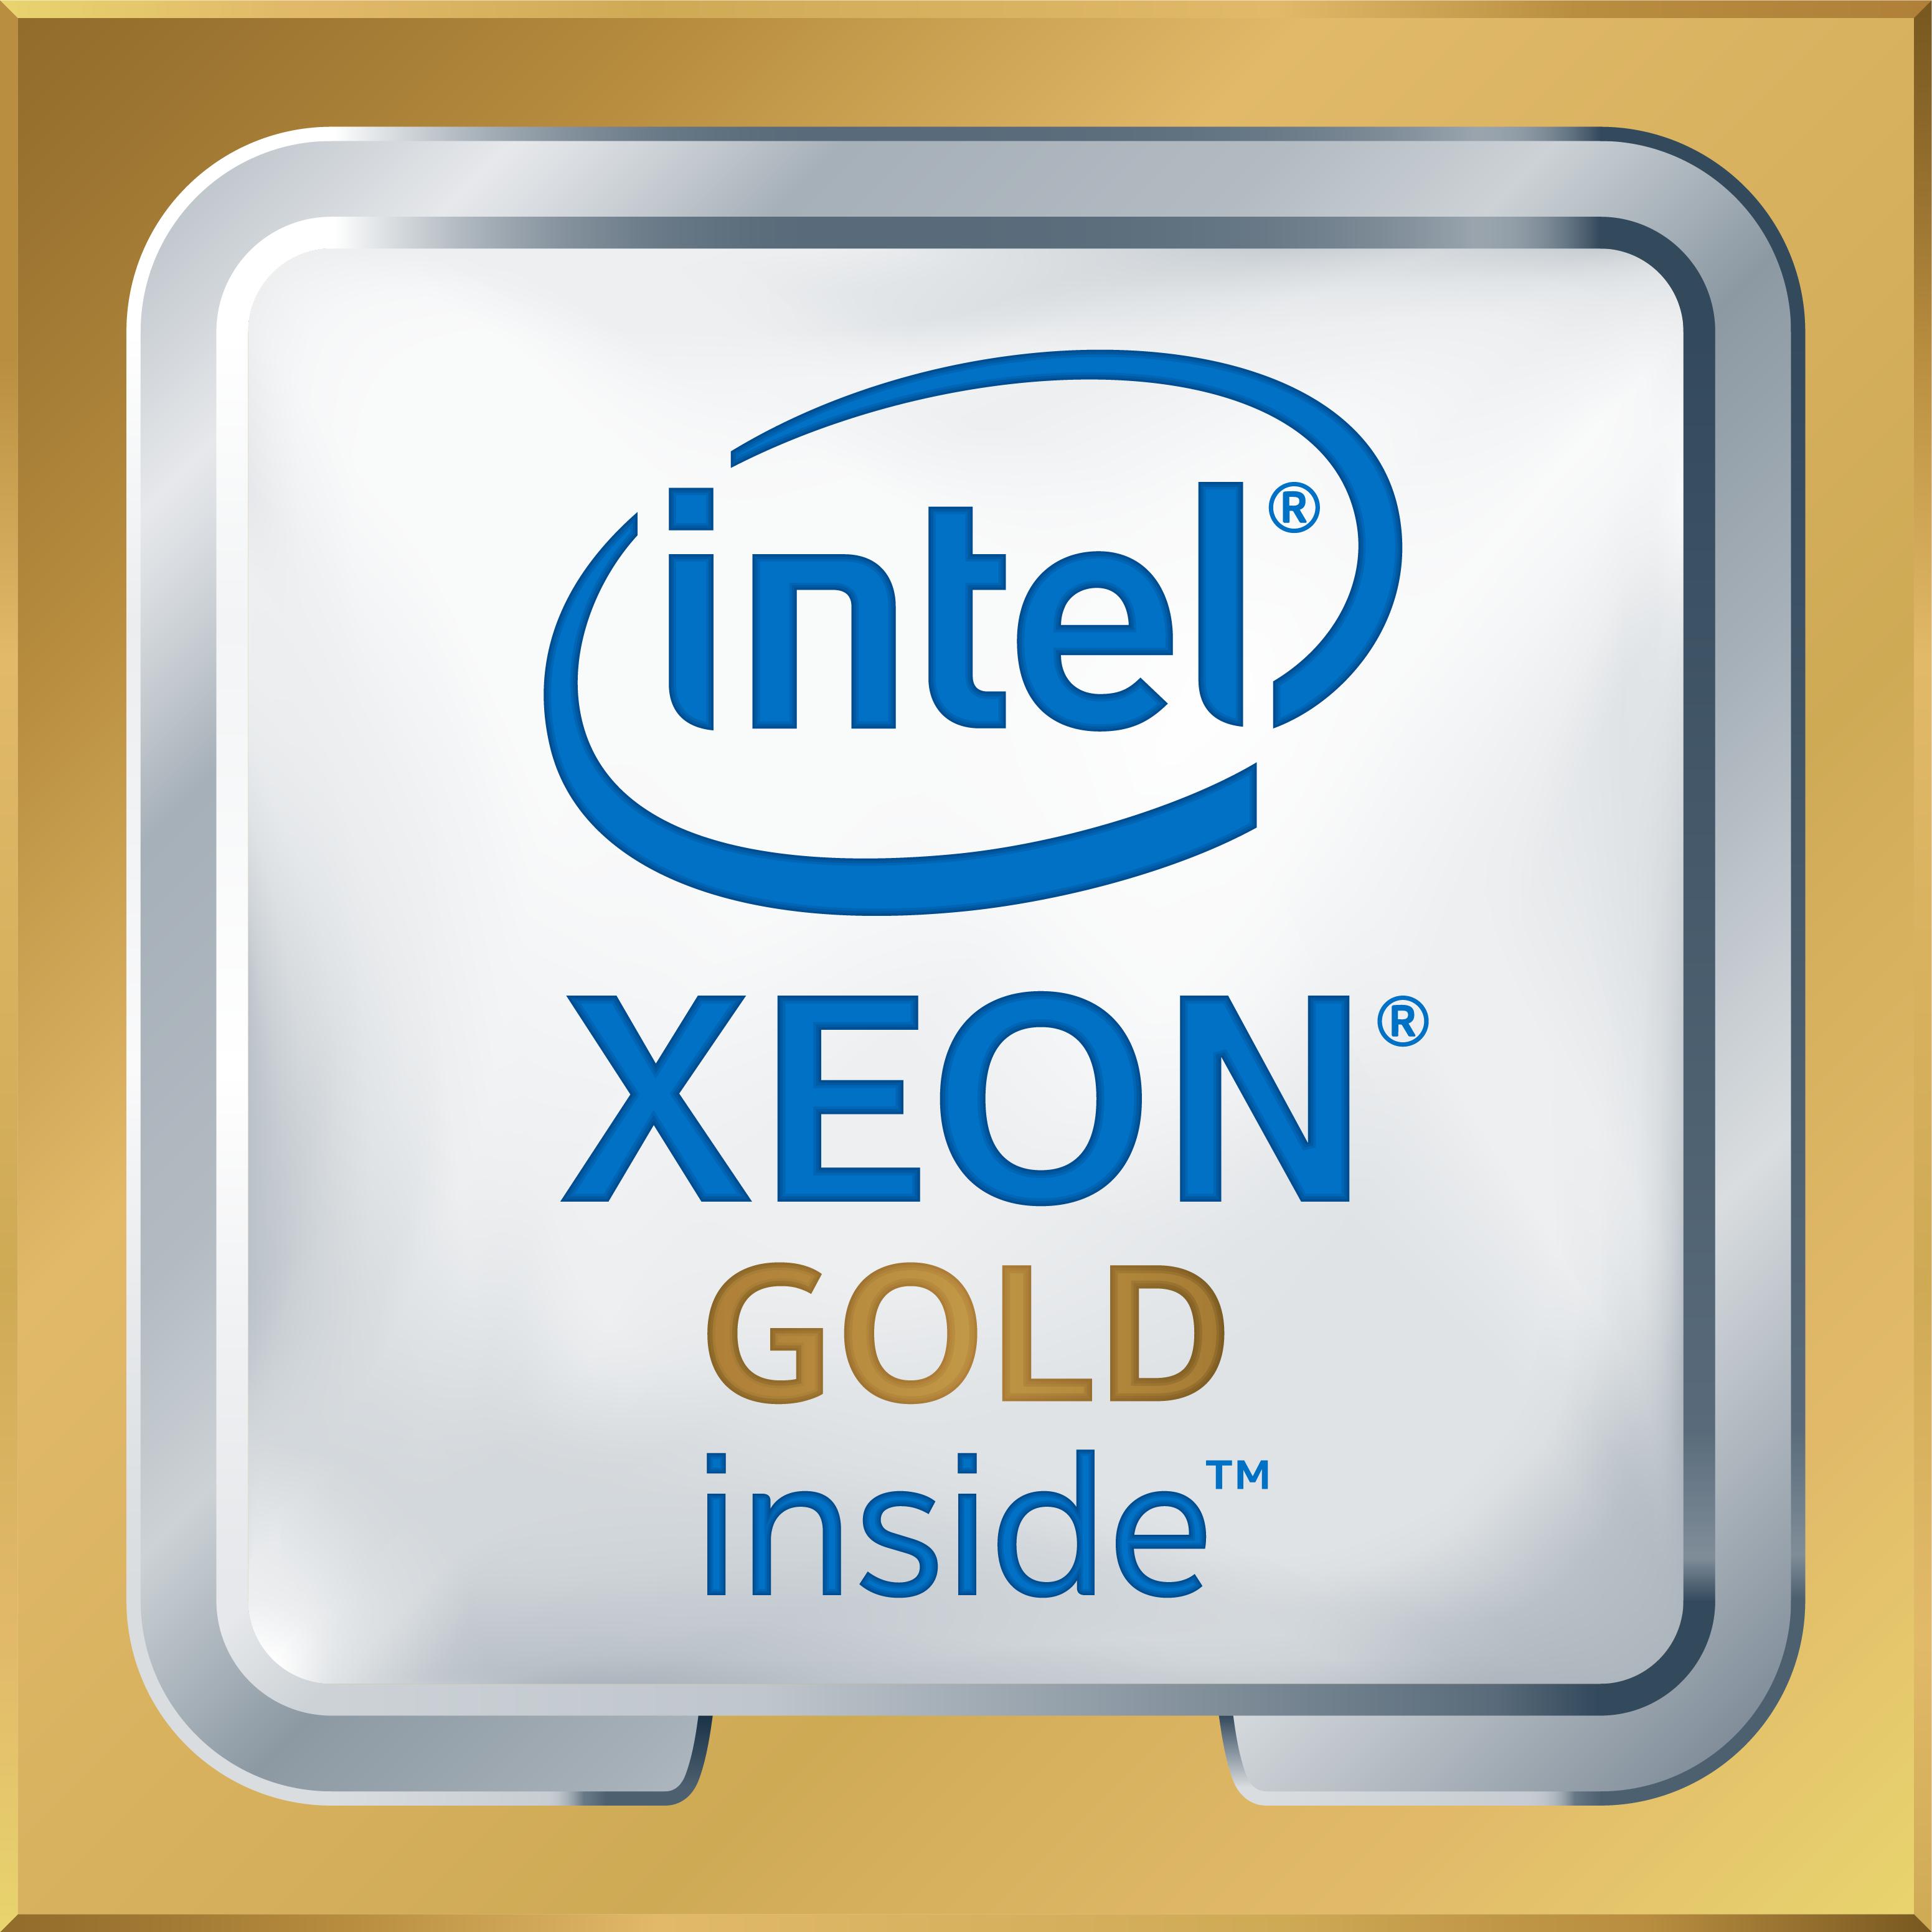 Intel Xeon ® ® Gold 6134 Processor (24.75M Cache - 3.20 GHz) 3.20GHz 24.75MB L3 Prozessor